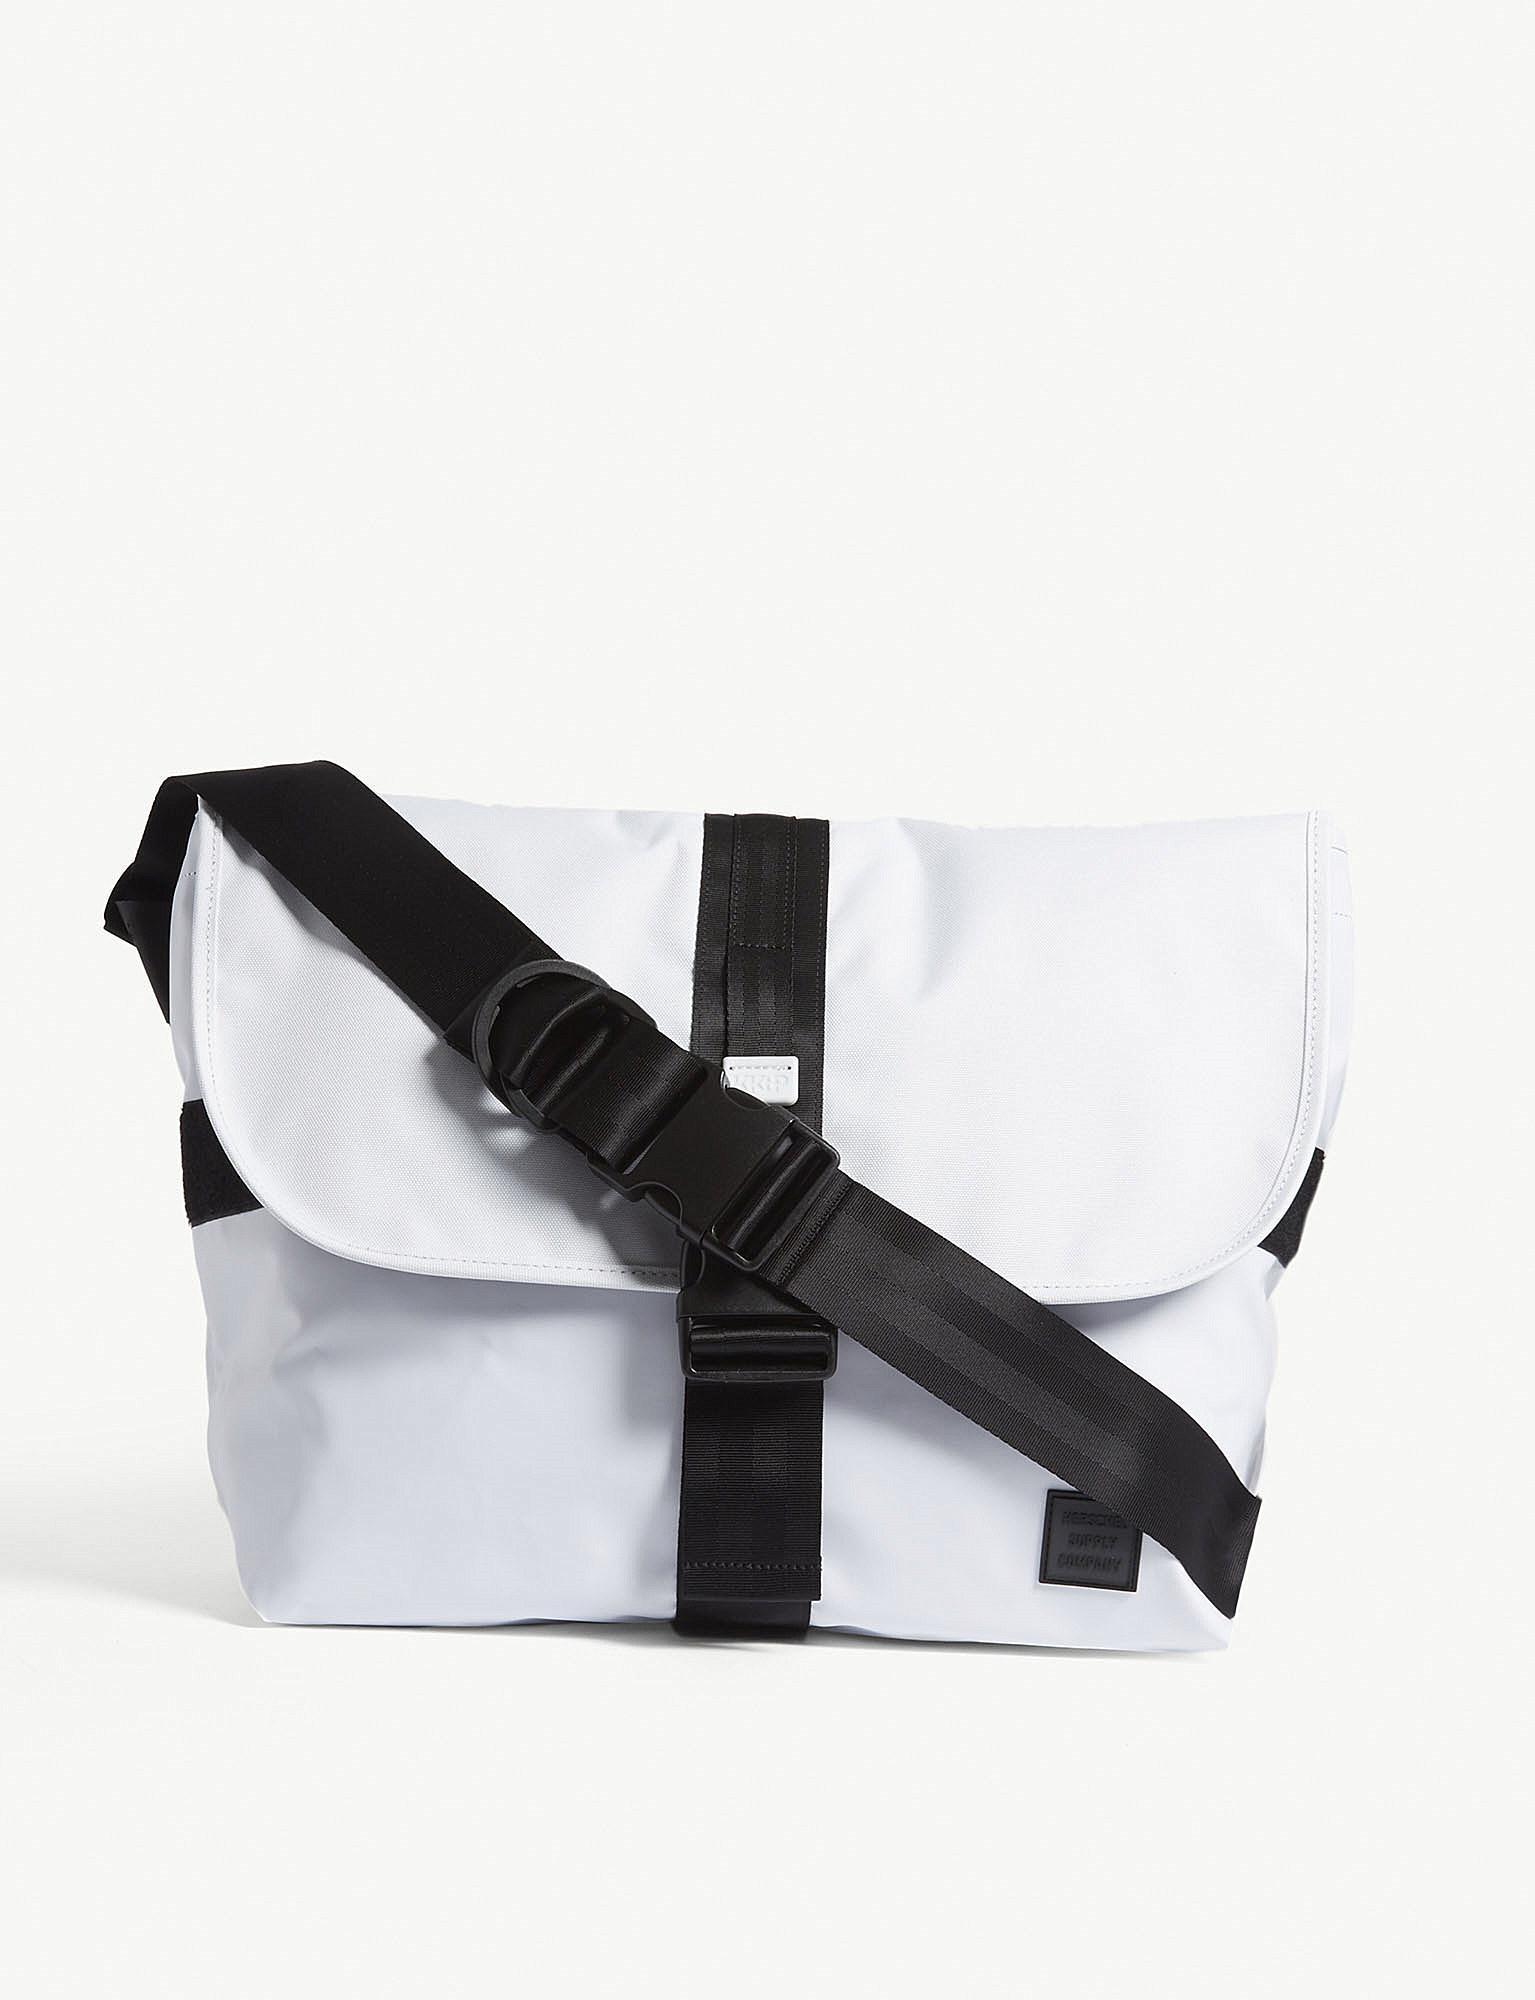 45799a20e6e2 Lyst - Herschel Supply Co. Odell Messenger Bag in Black for Men